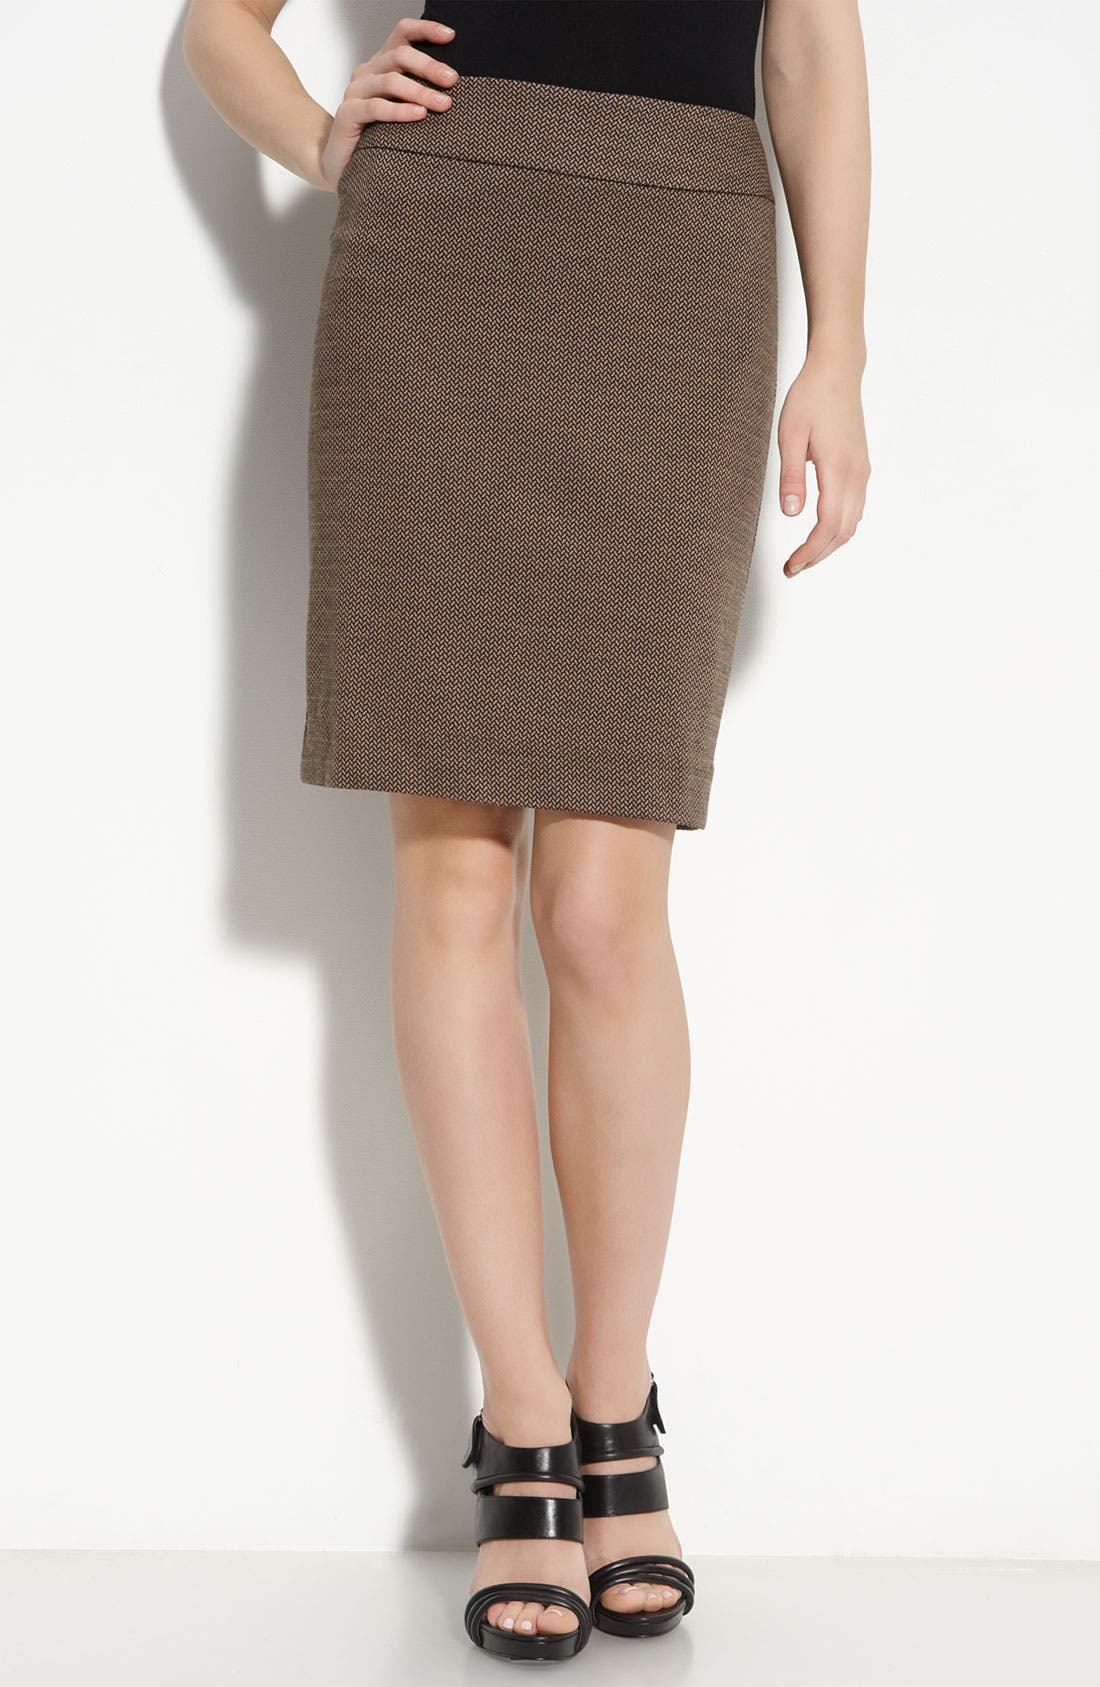 Alternate Image 1 Selected - Halogen® Patterned Knit Skirt (Petite)